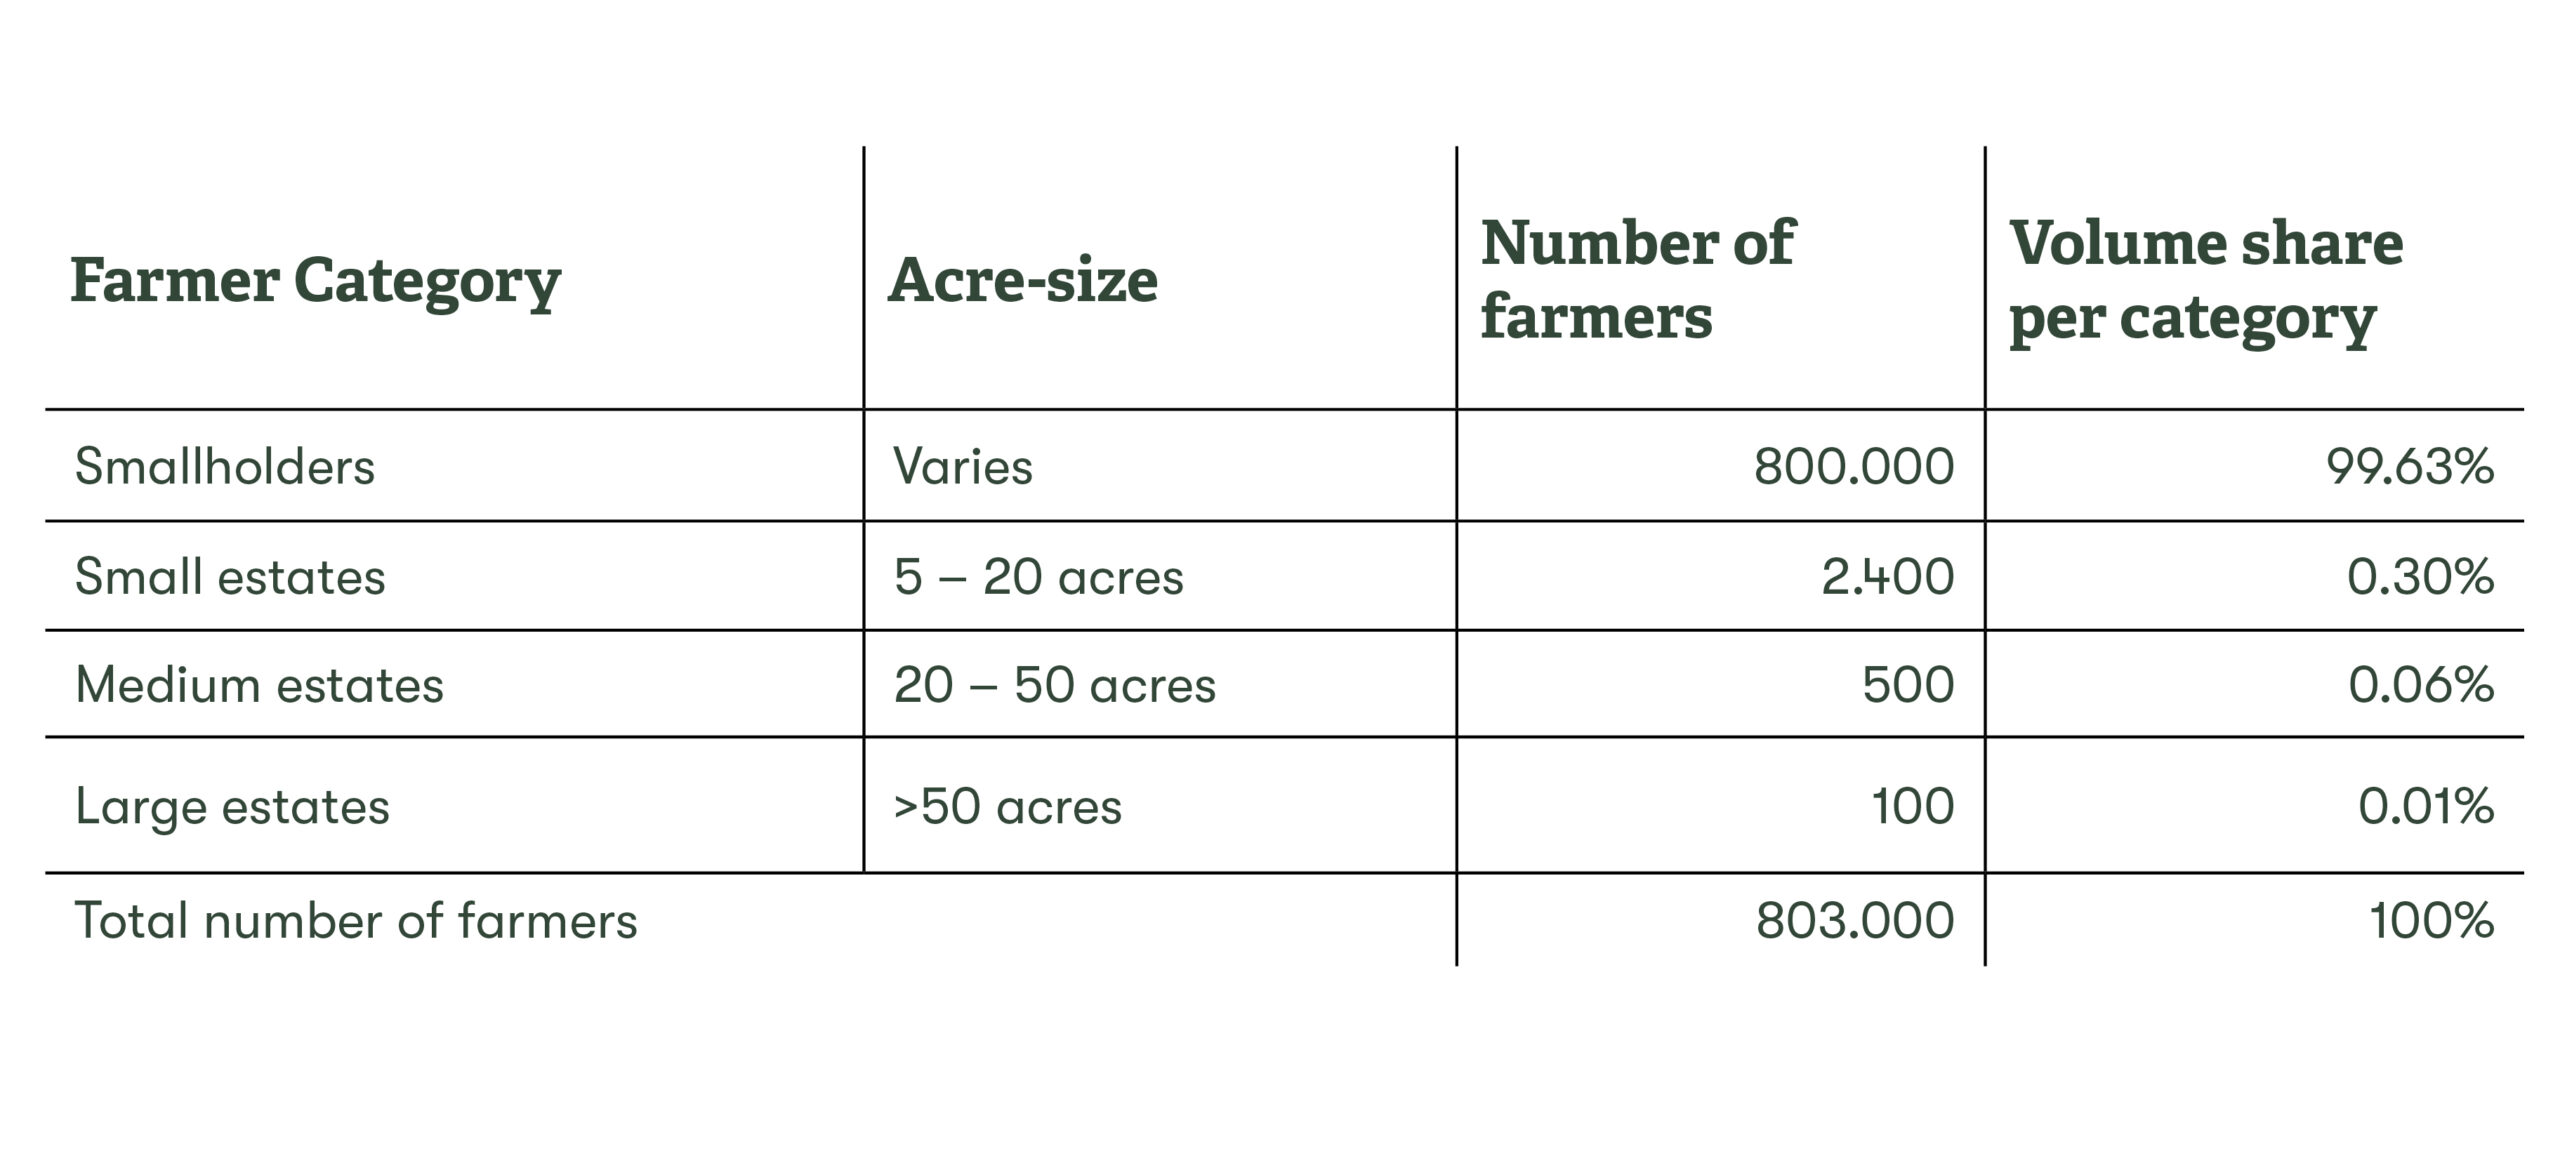 https://trabocca.com/wp-content/uploads/2020/05/Farmer-data-2-scaled.jpg